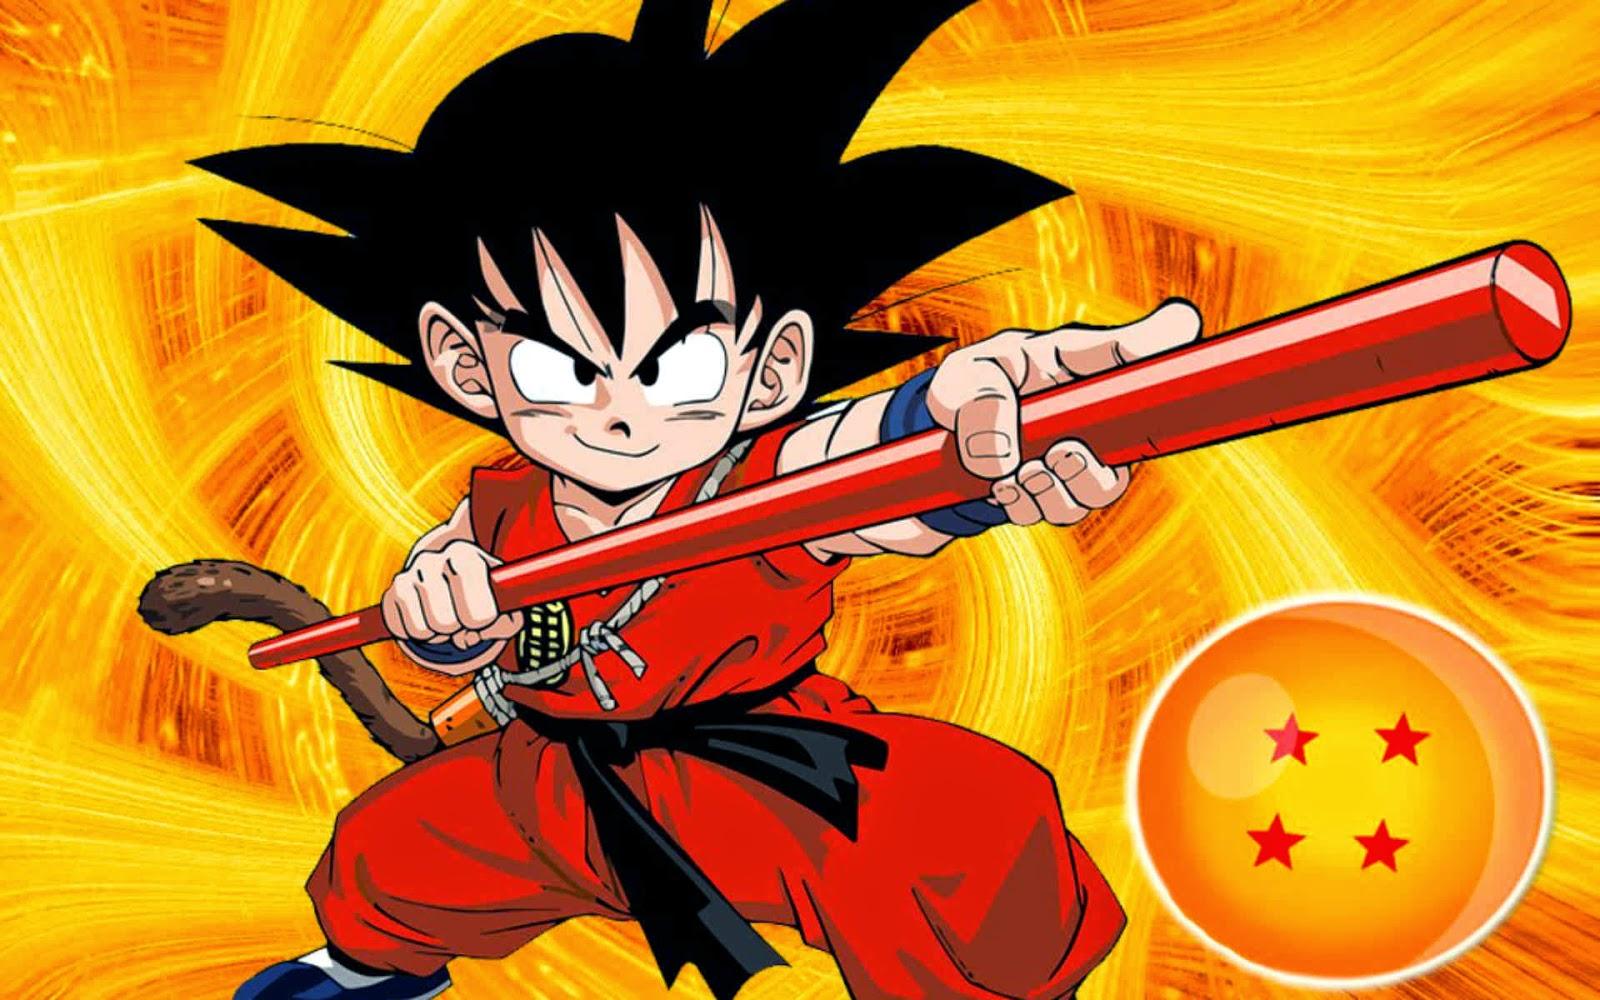 Dbz 3d Wallpapers Dragon Ball Kid Goku Wallpaper Hd O Wallpaper Picture